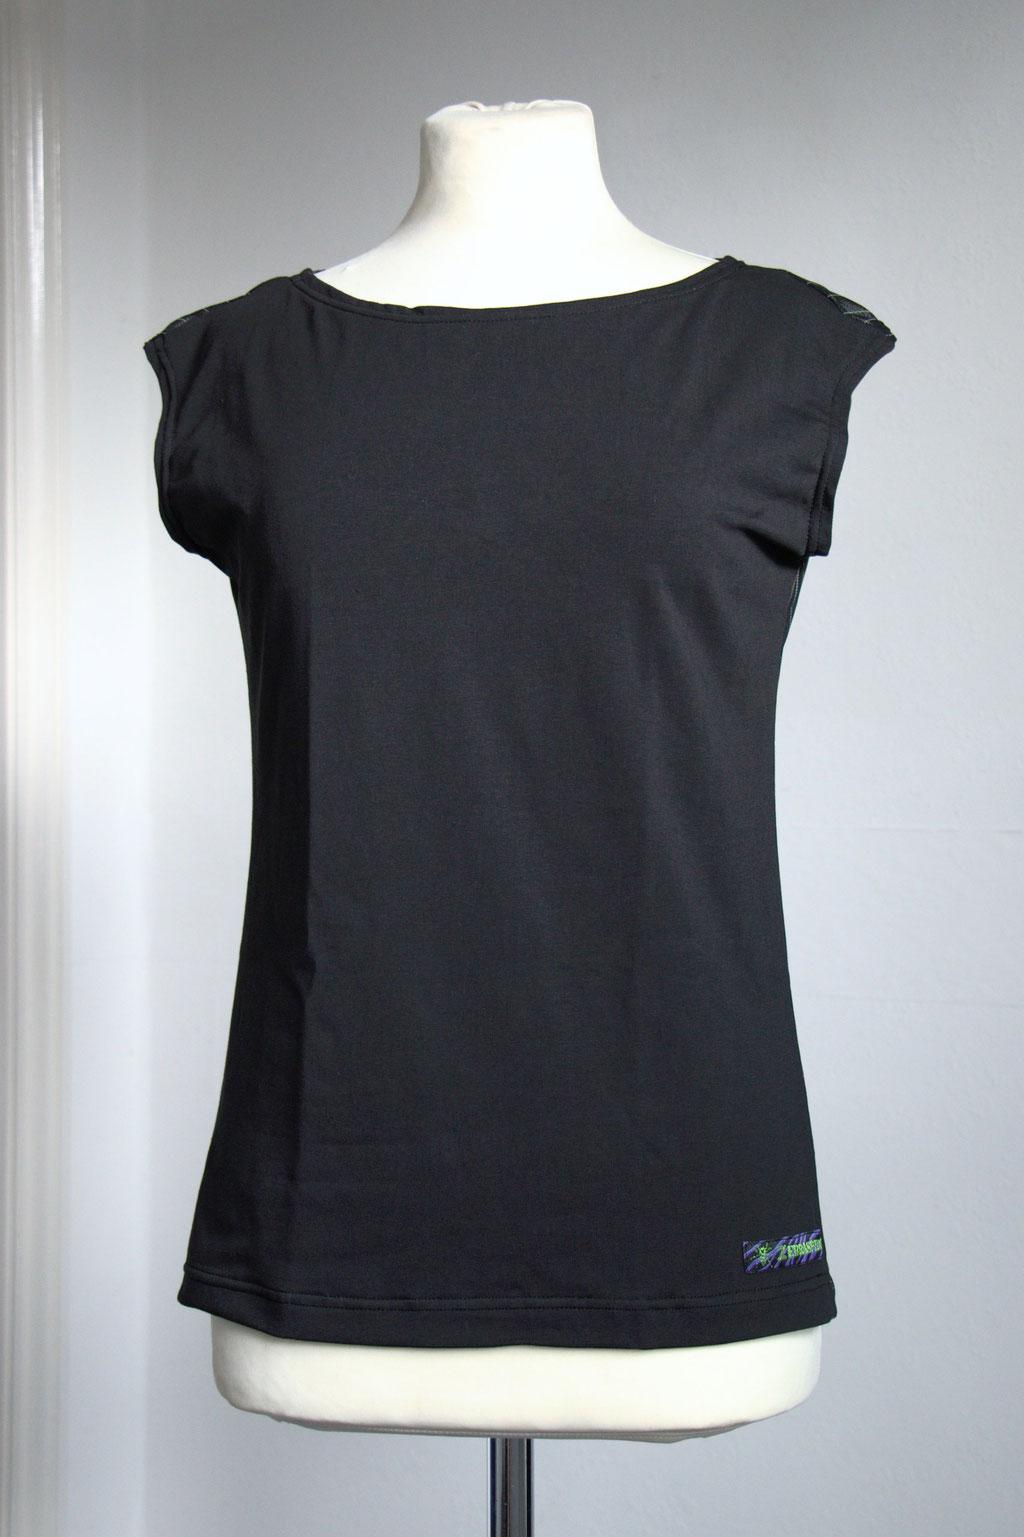 Custom belt bags and summer tops - black shirt front - Zebraspider Eco Anti-Fashion